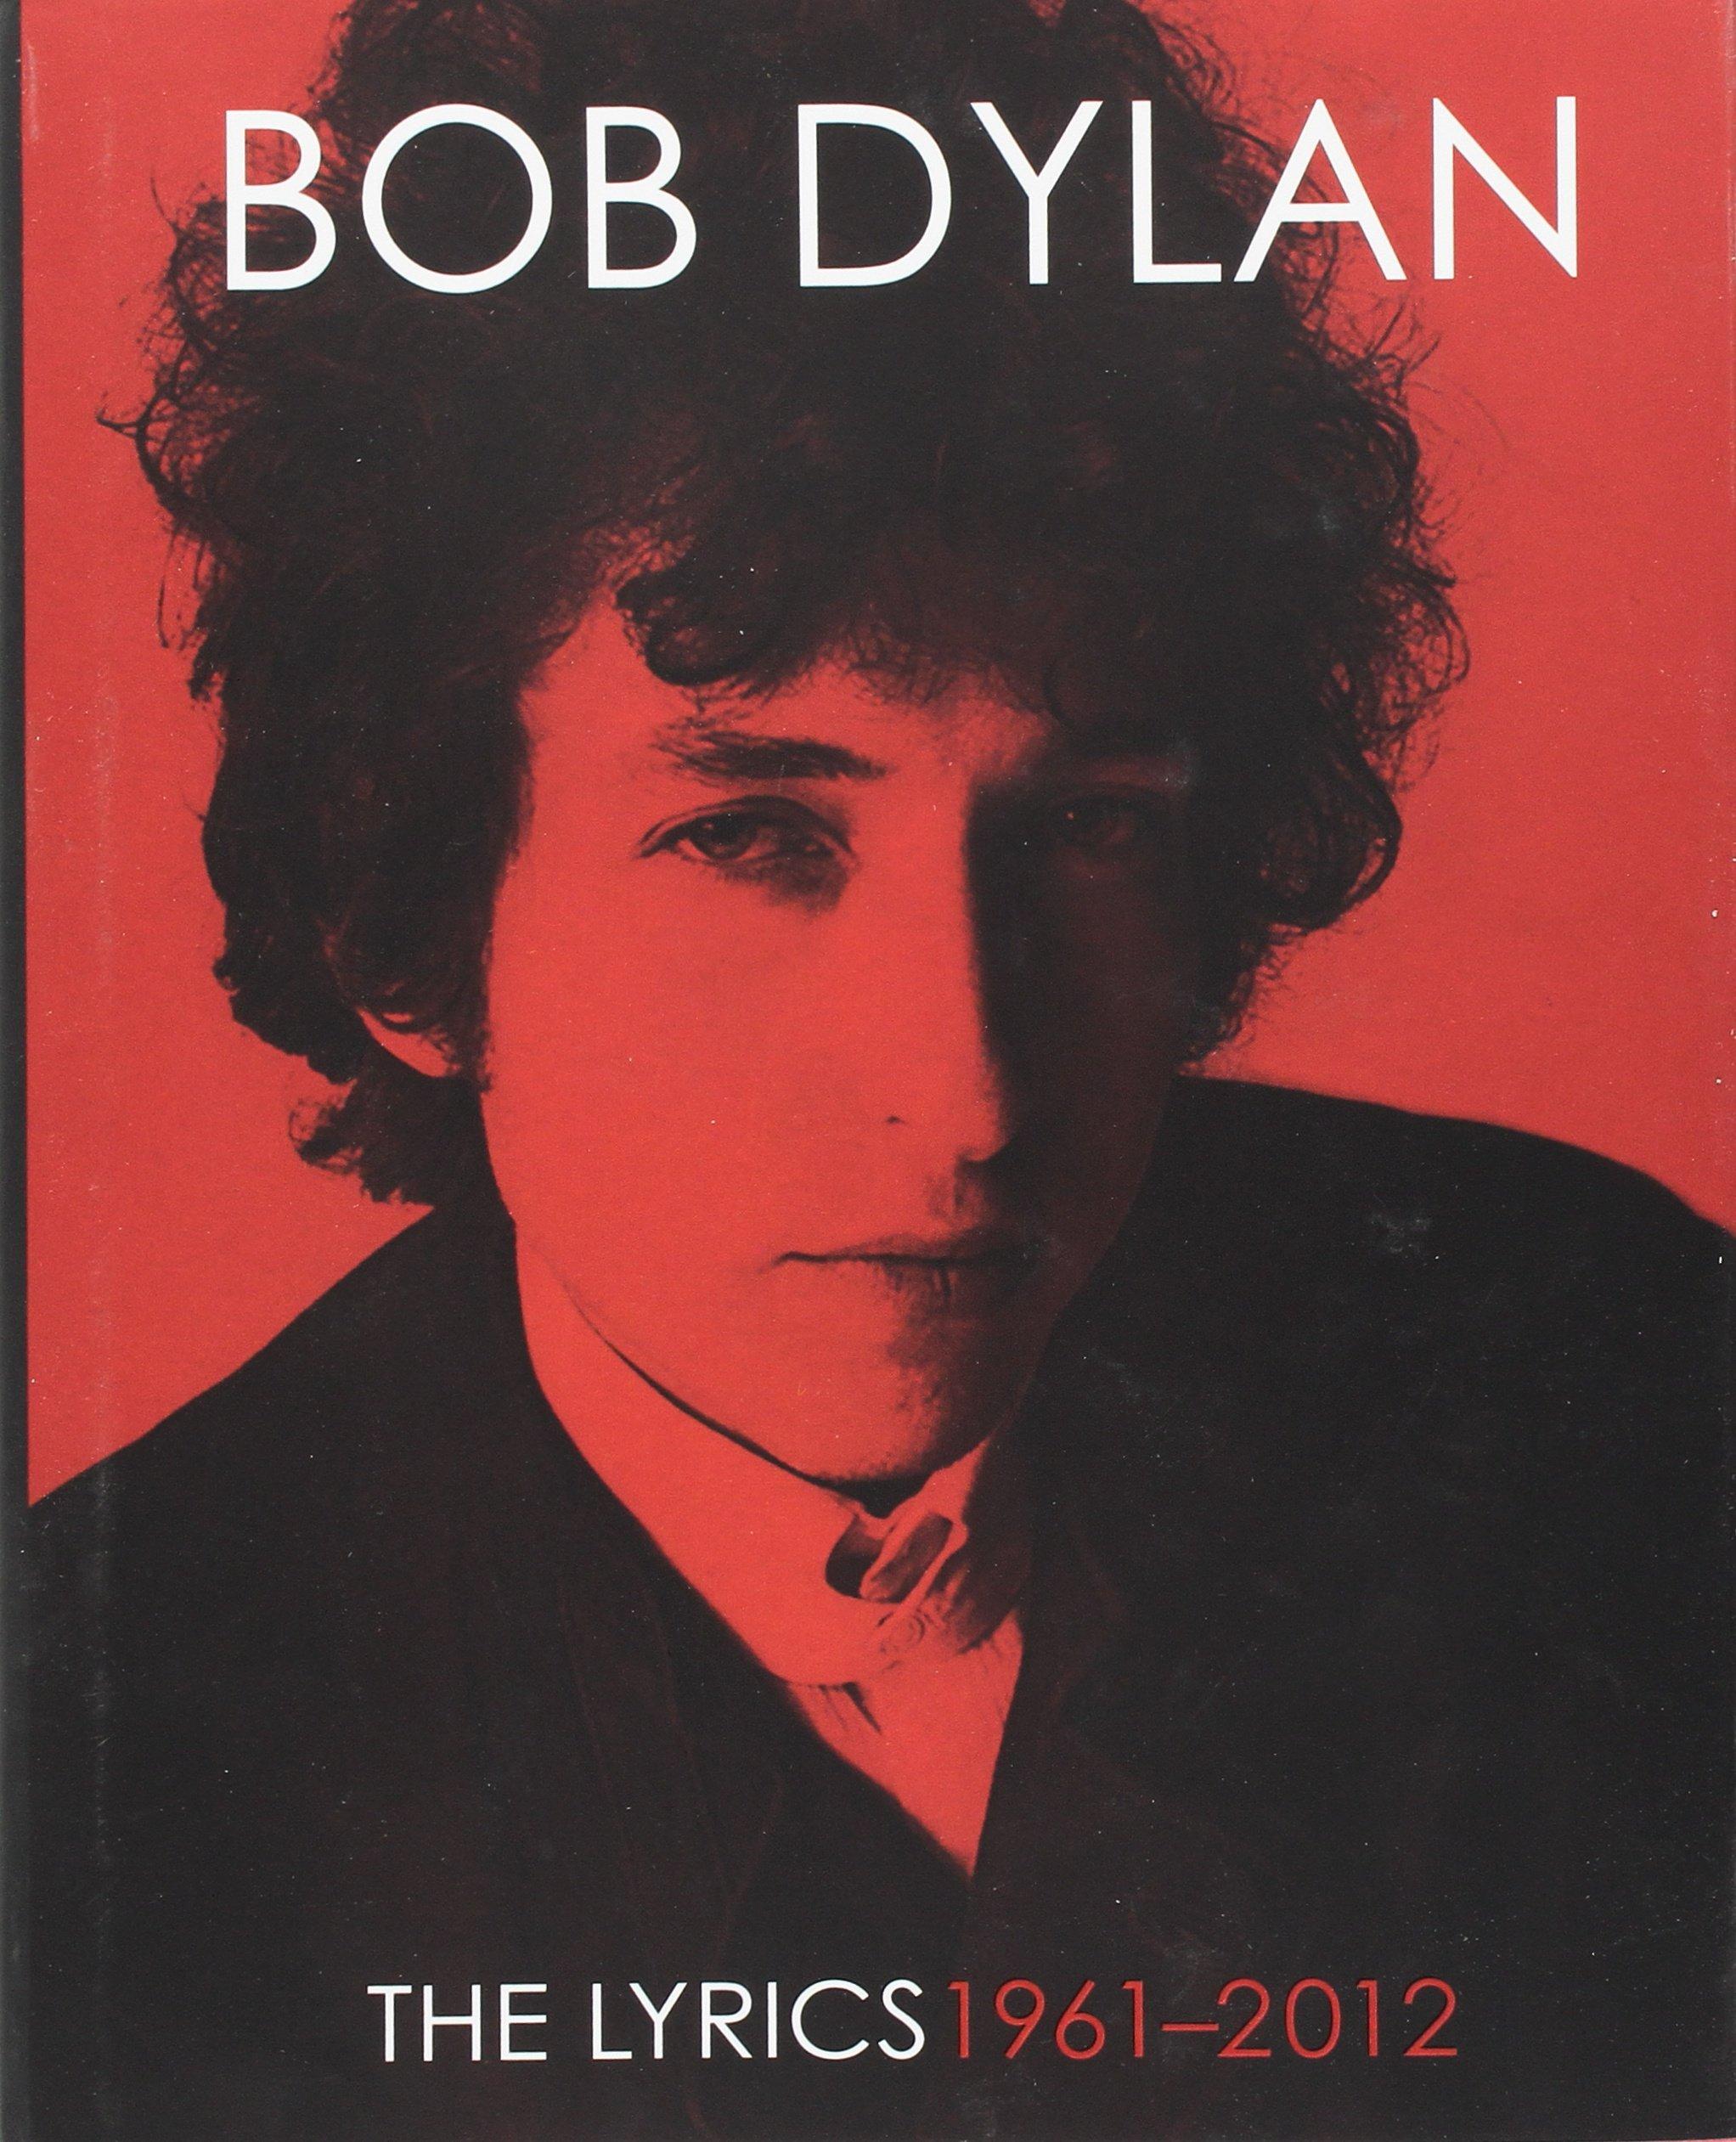 The Lyrics: 1961-2012 by Simon & Schuster